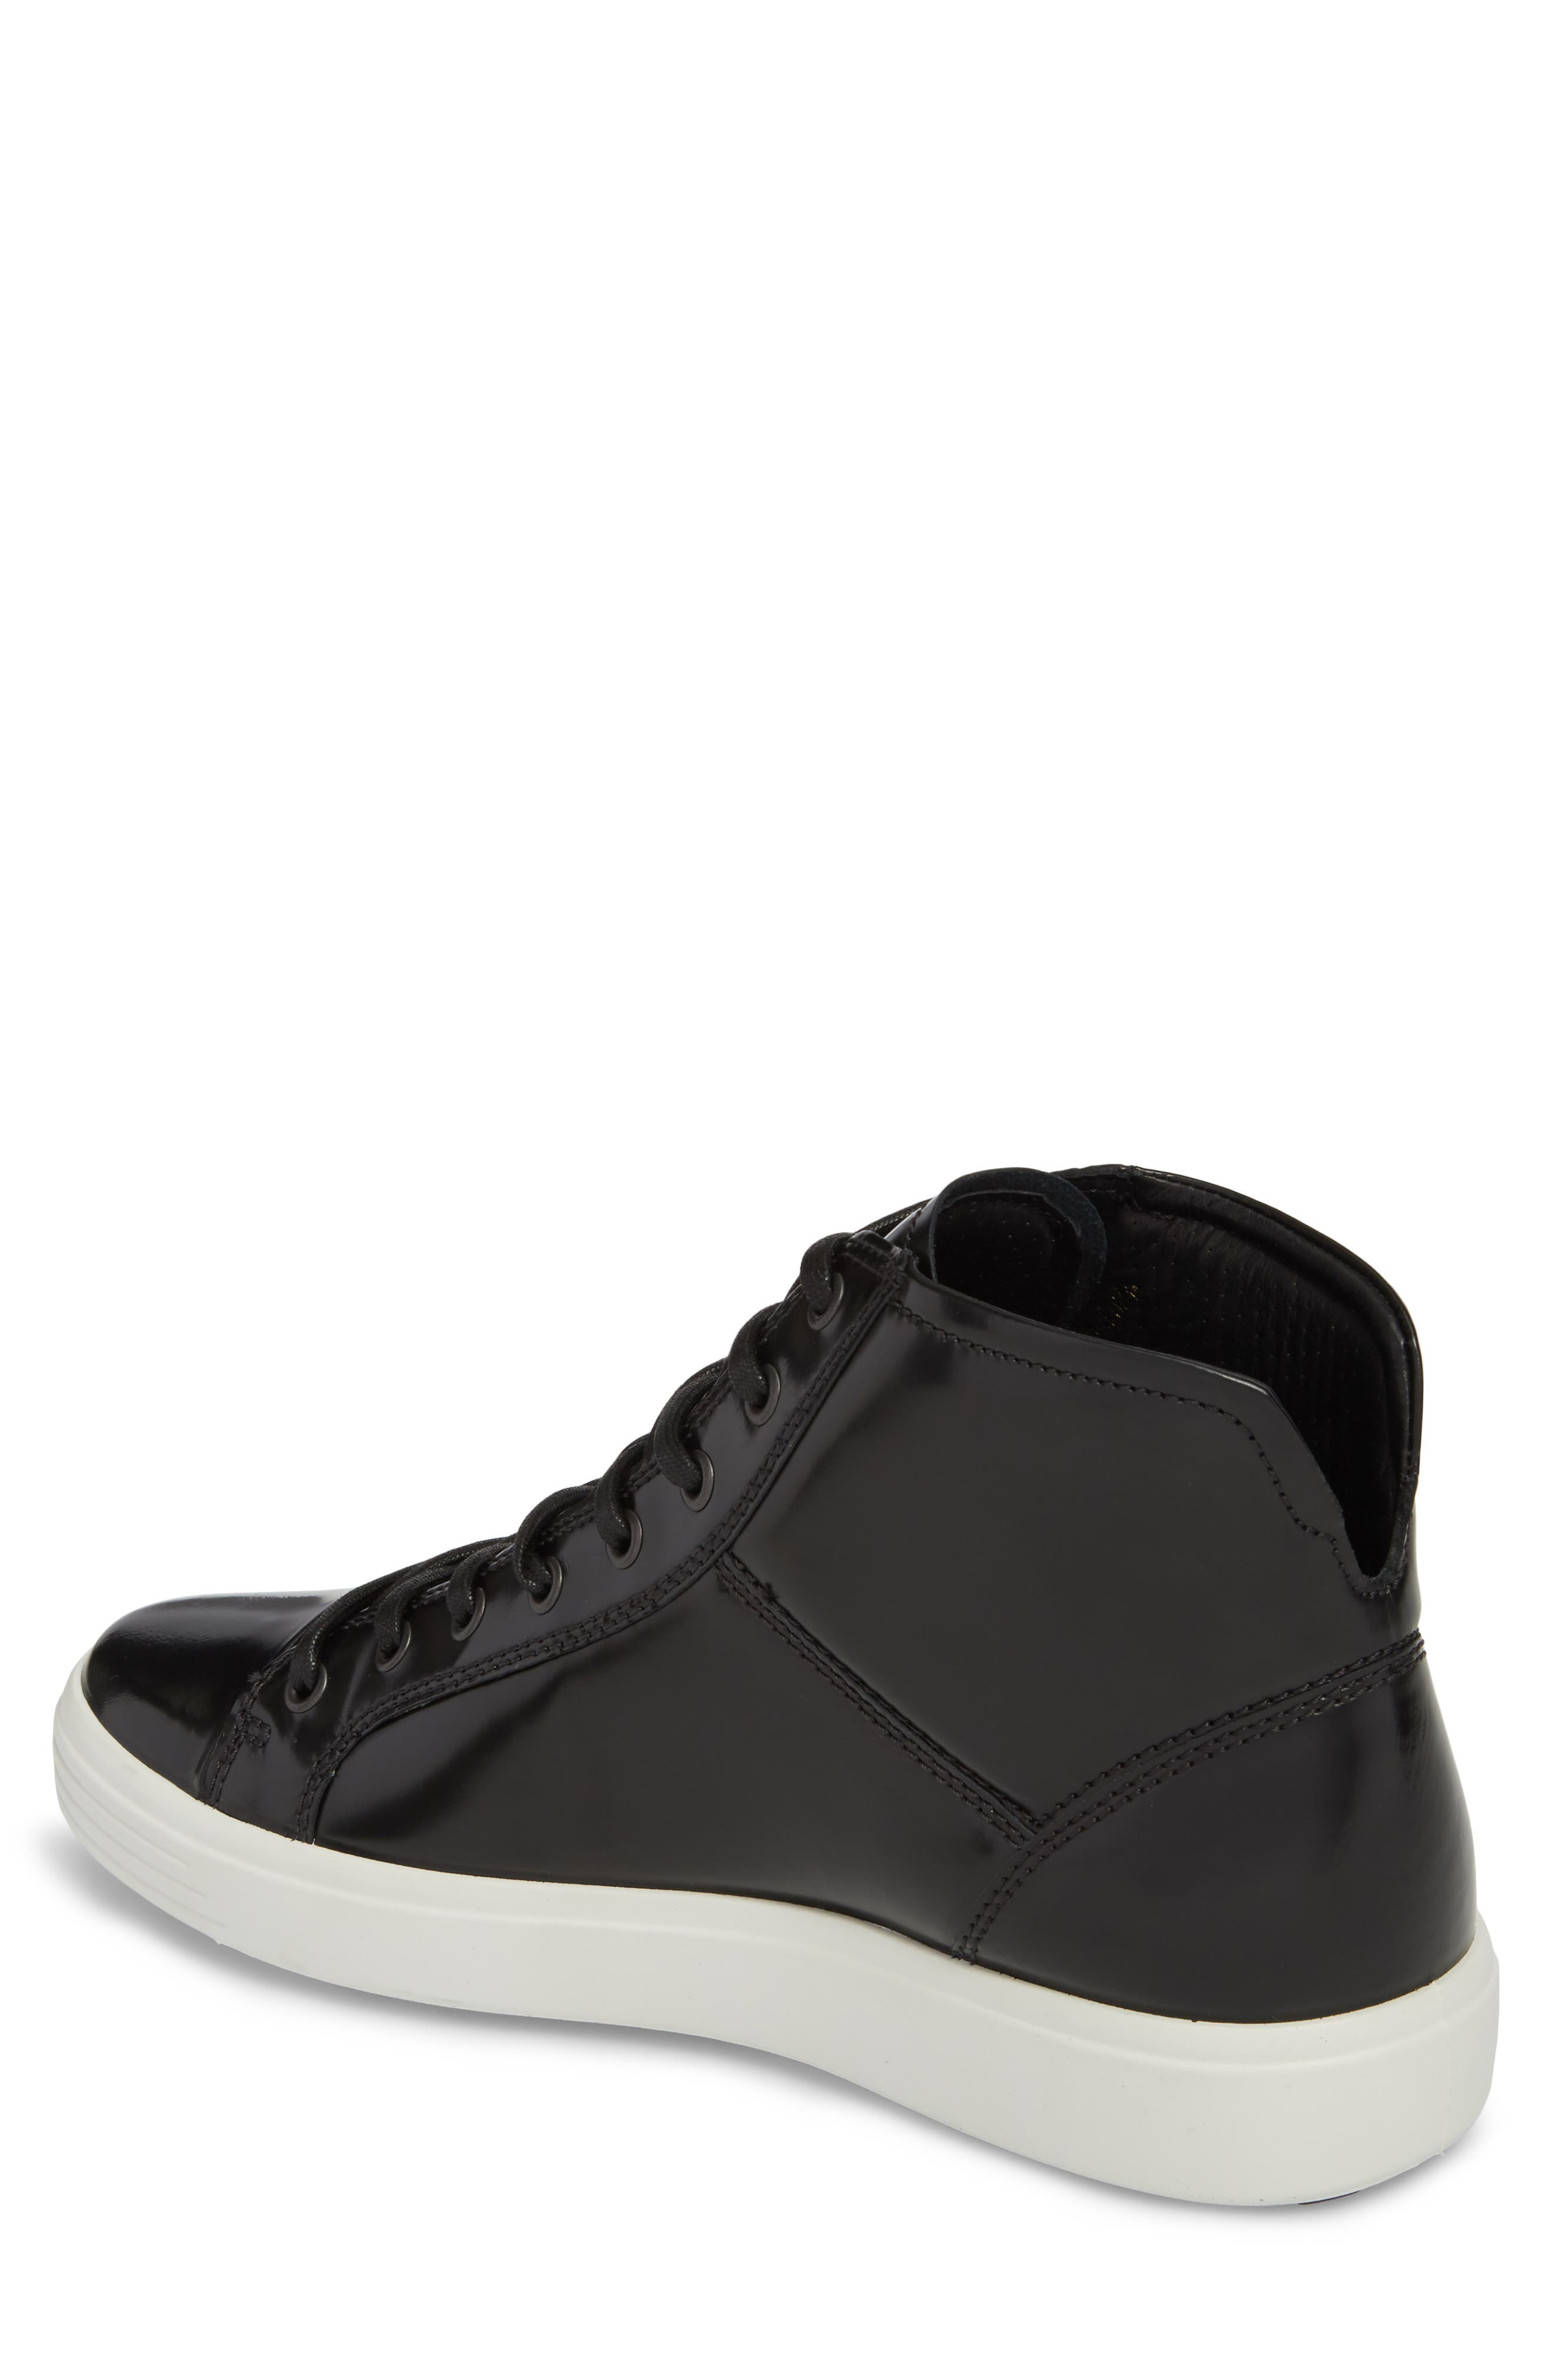 Soft 7 Premium High Top Sneaker,                             Alternate thumbnail 2, color,                             009